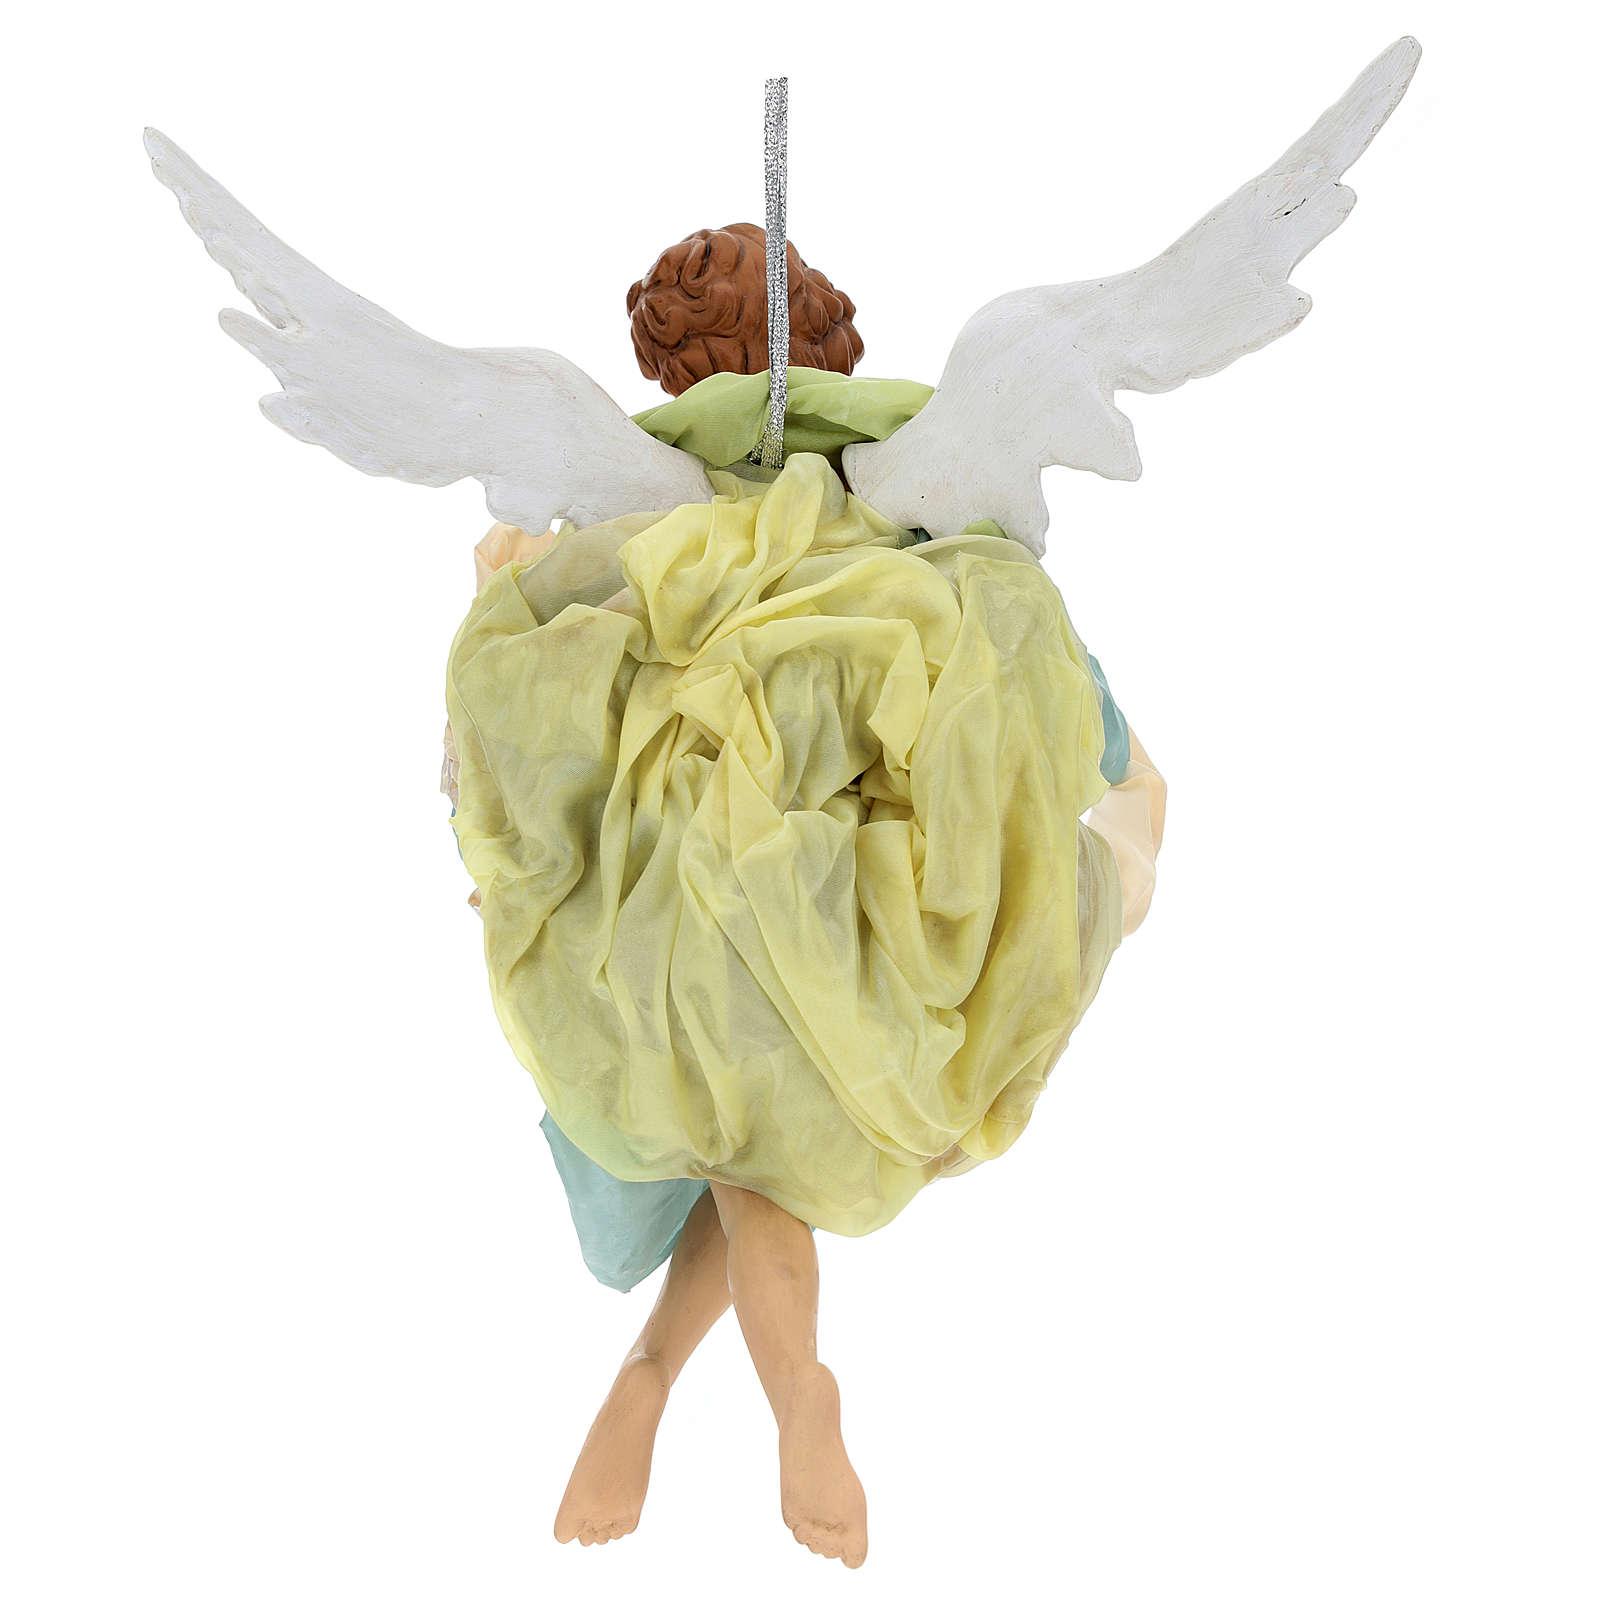 Neapolitan Nativity figurine, green angel, 45 cm 4